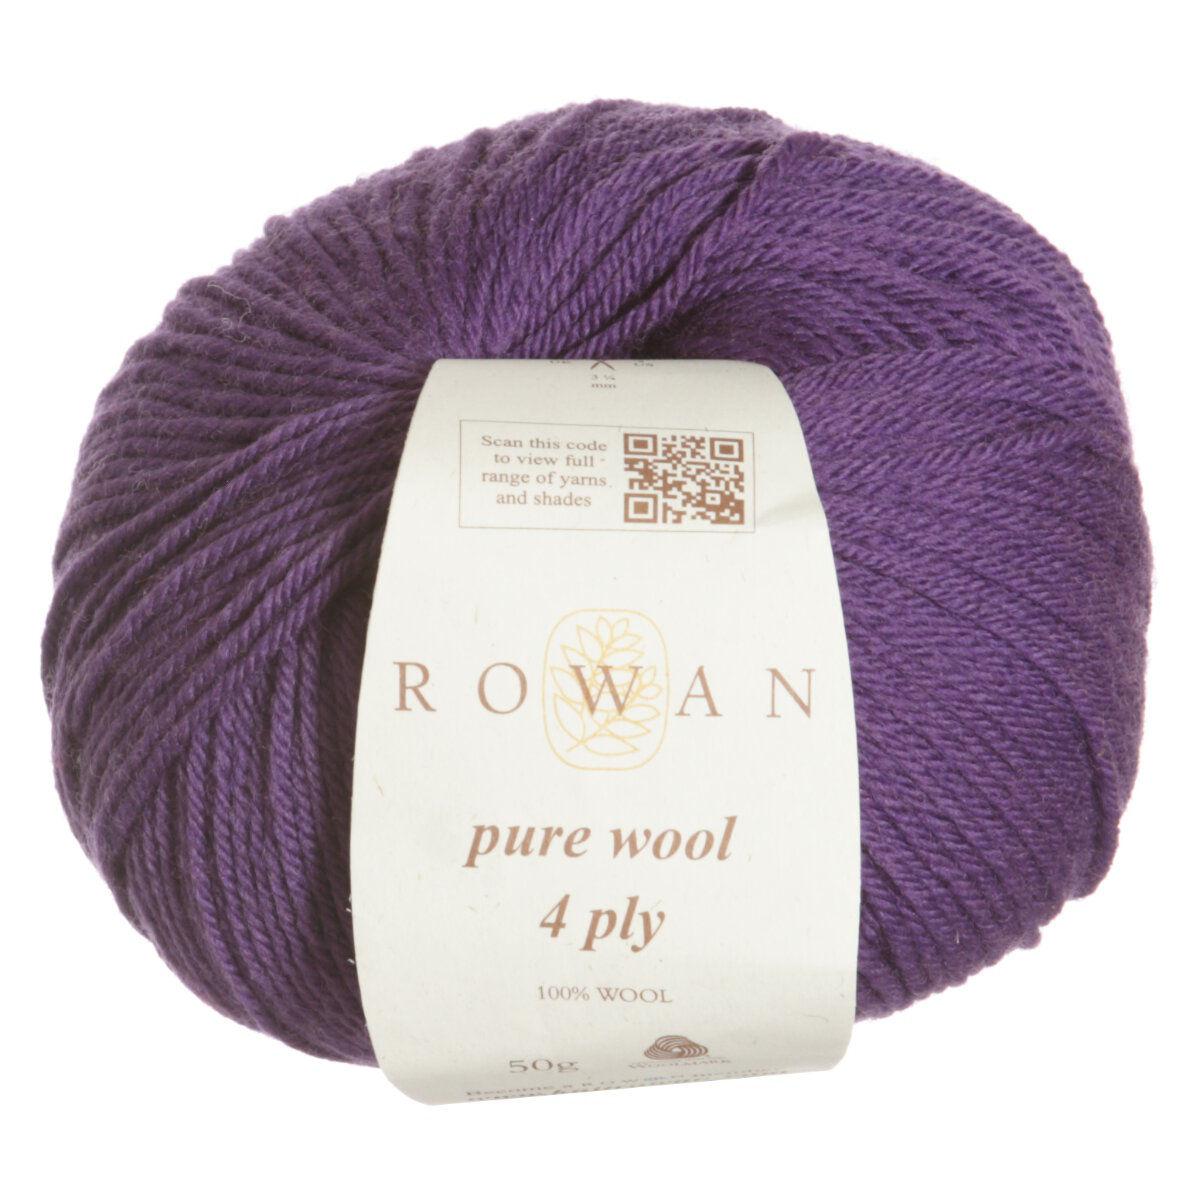 Knitting Patterns 4 Ply Wool : Rowan Pure Wool 4 ply Yarn at Jimmy Beans Wool